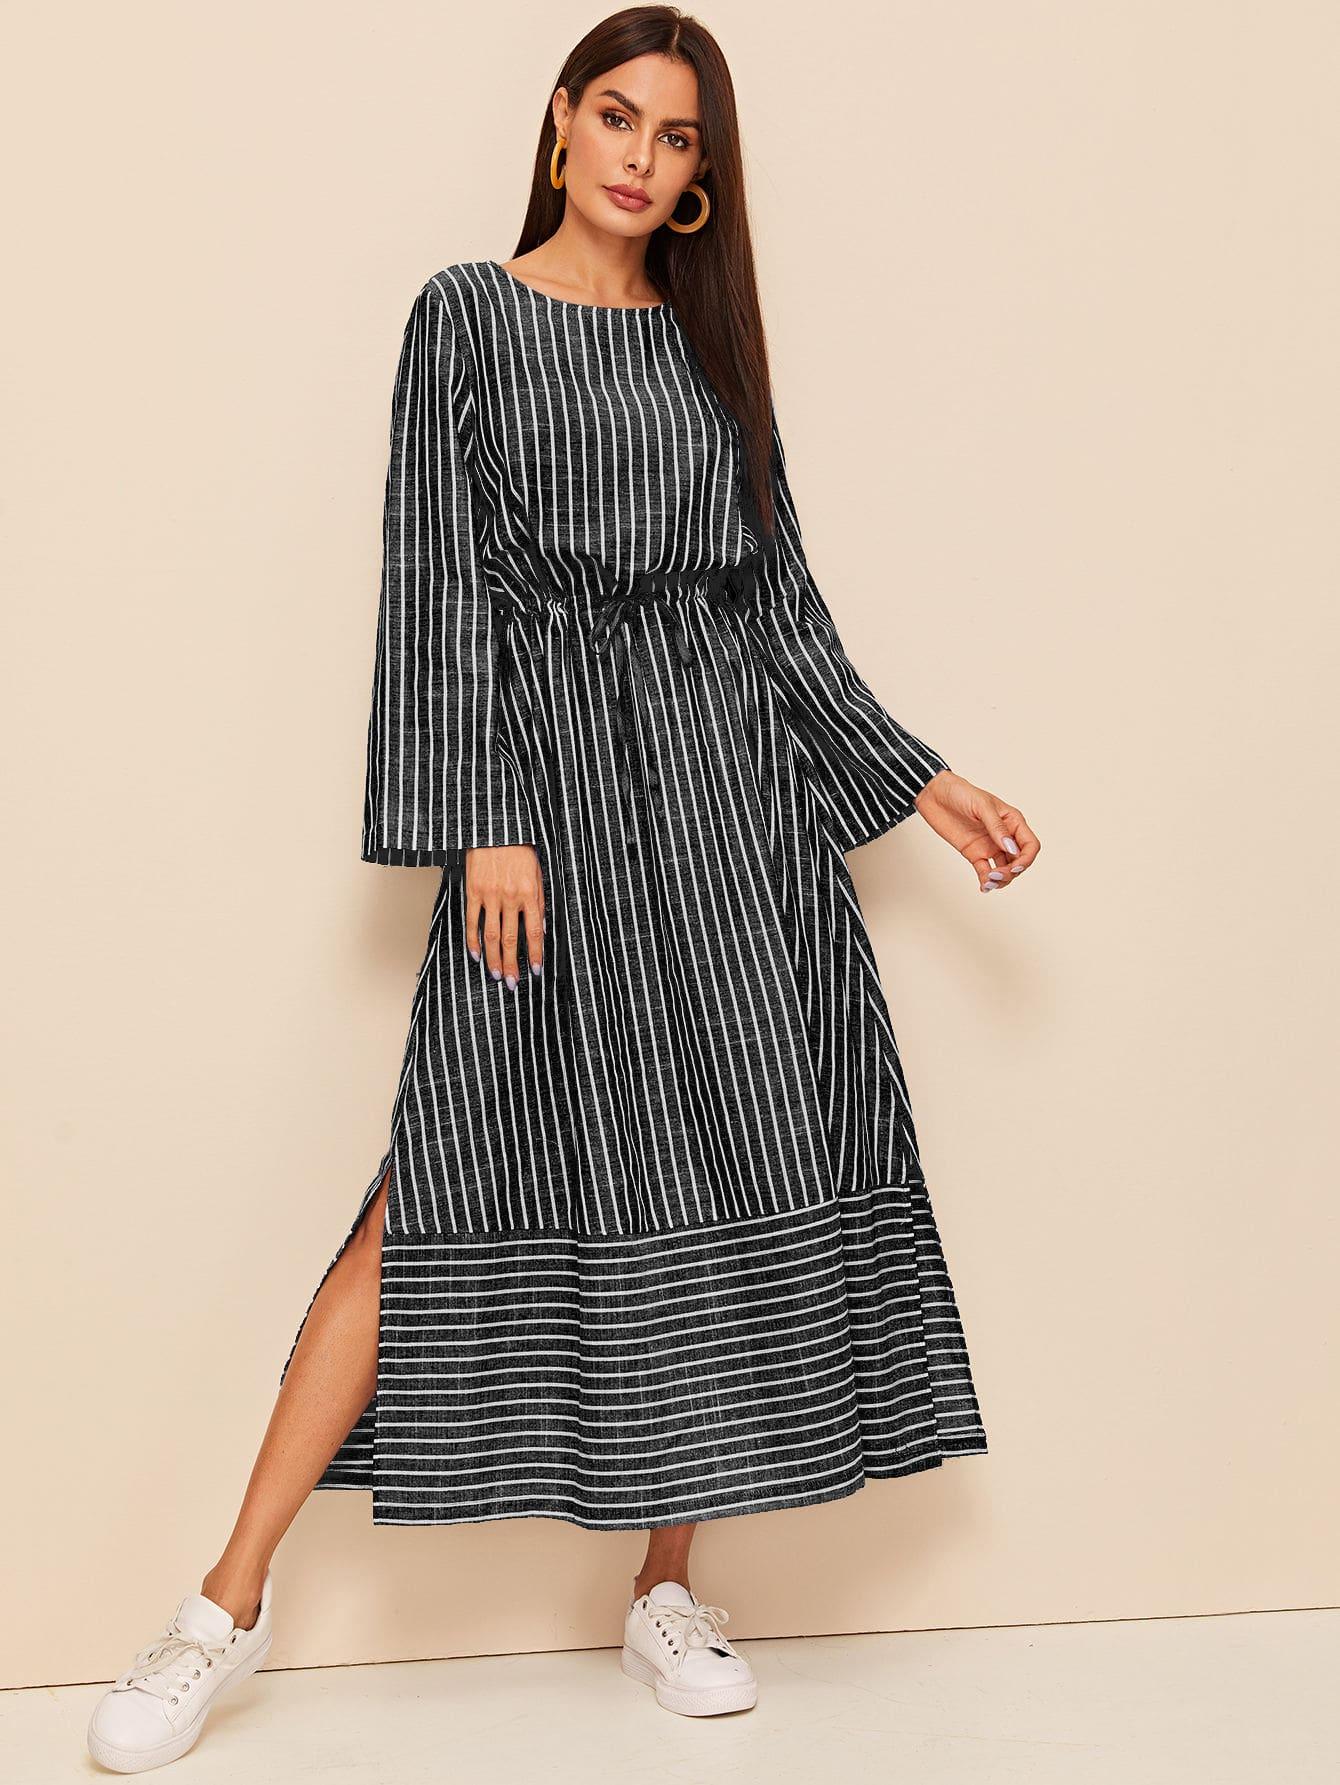 M-slit Hem Drawstring Waist Striped Dress